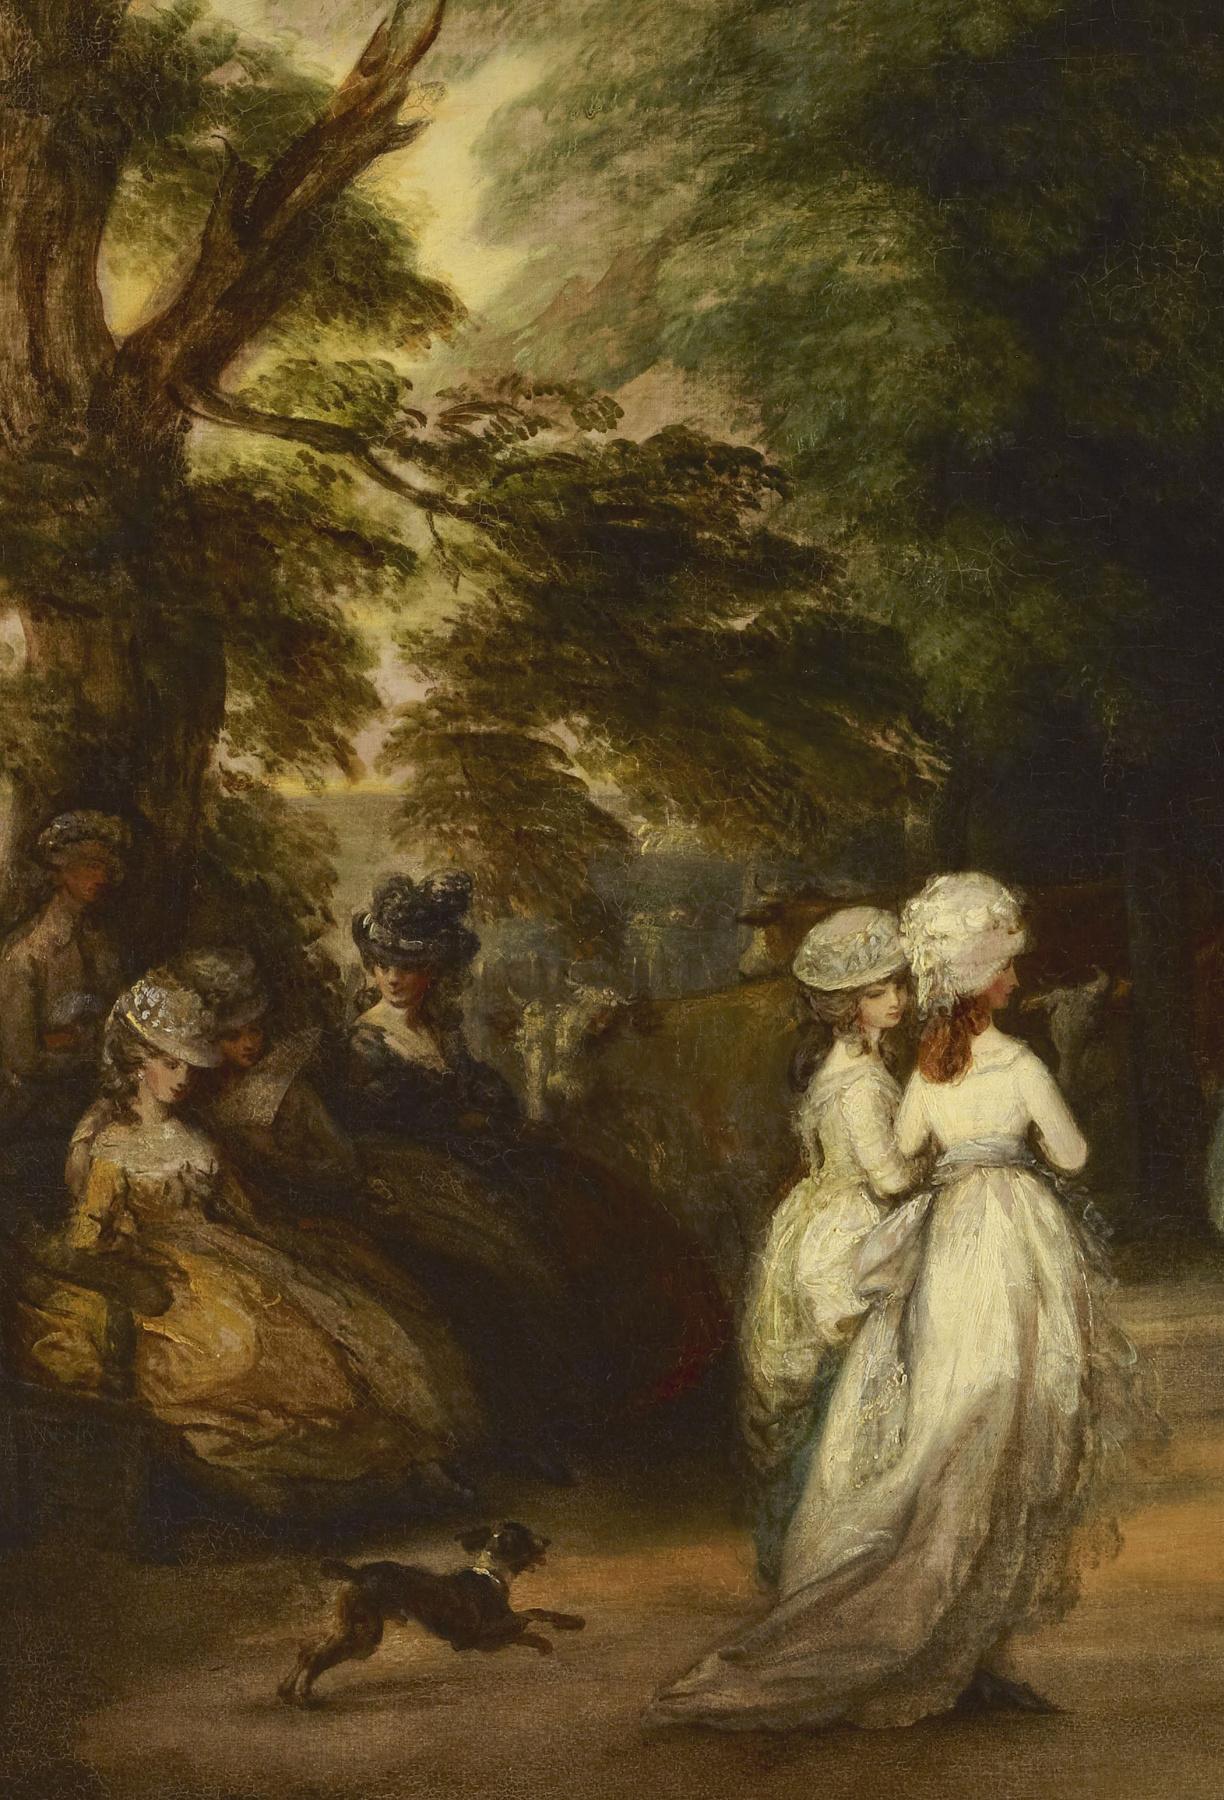 Thomas Gainsborough. A walk in St. James's Park. Fragment II